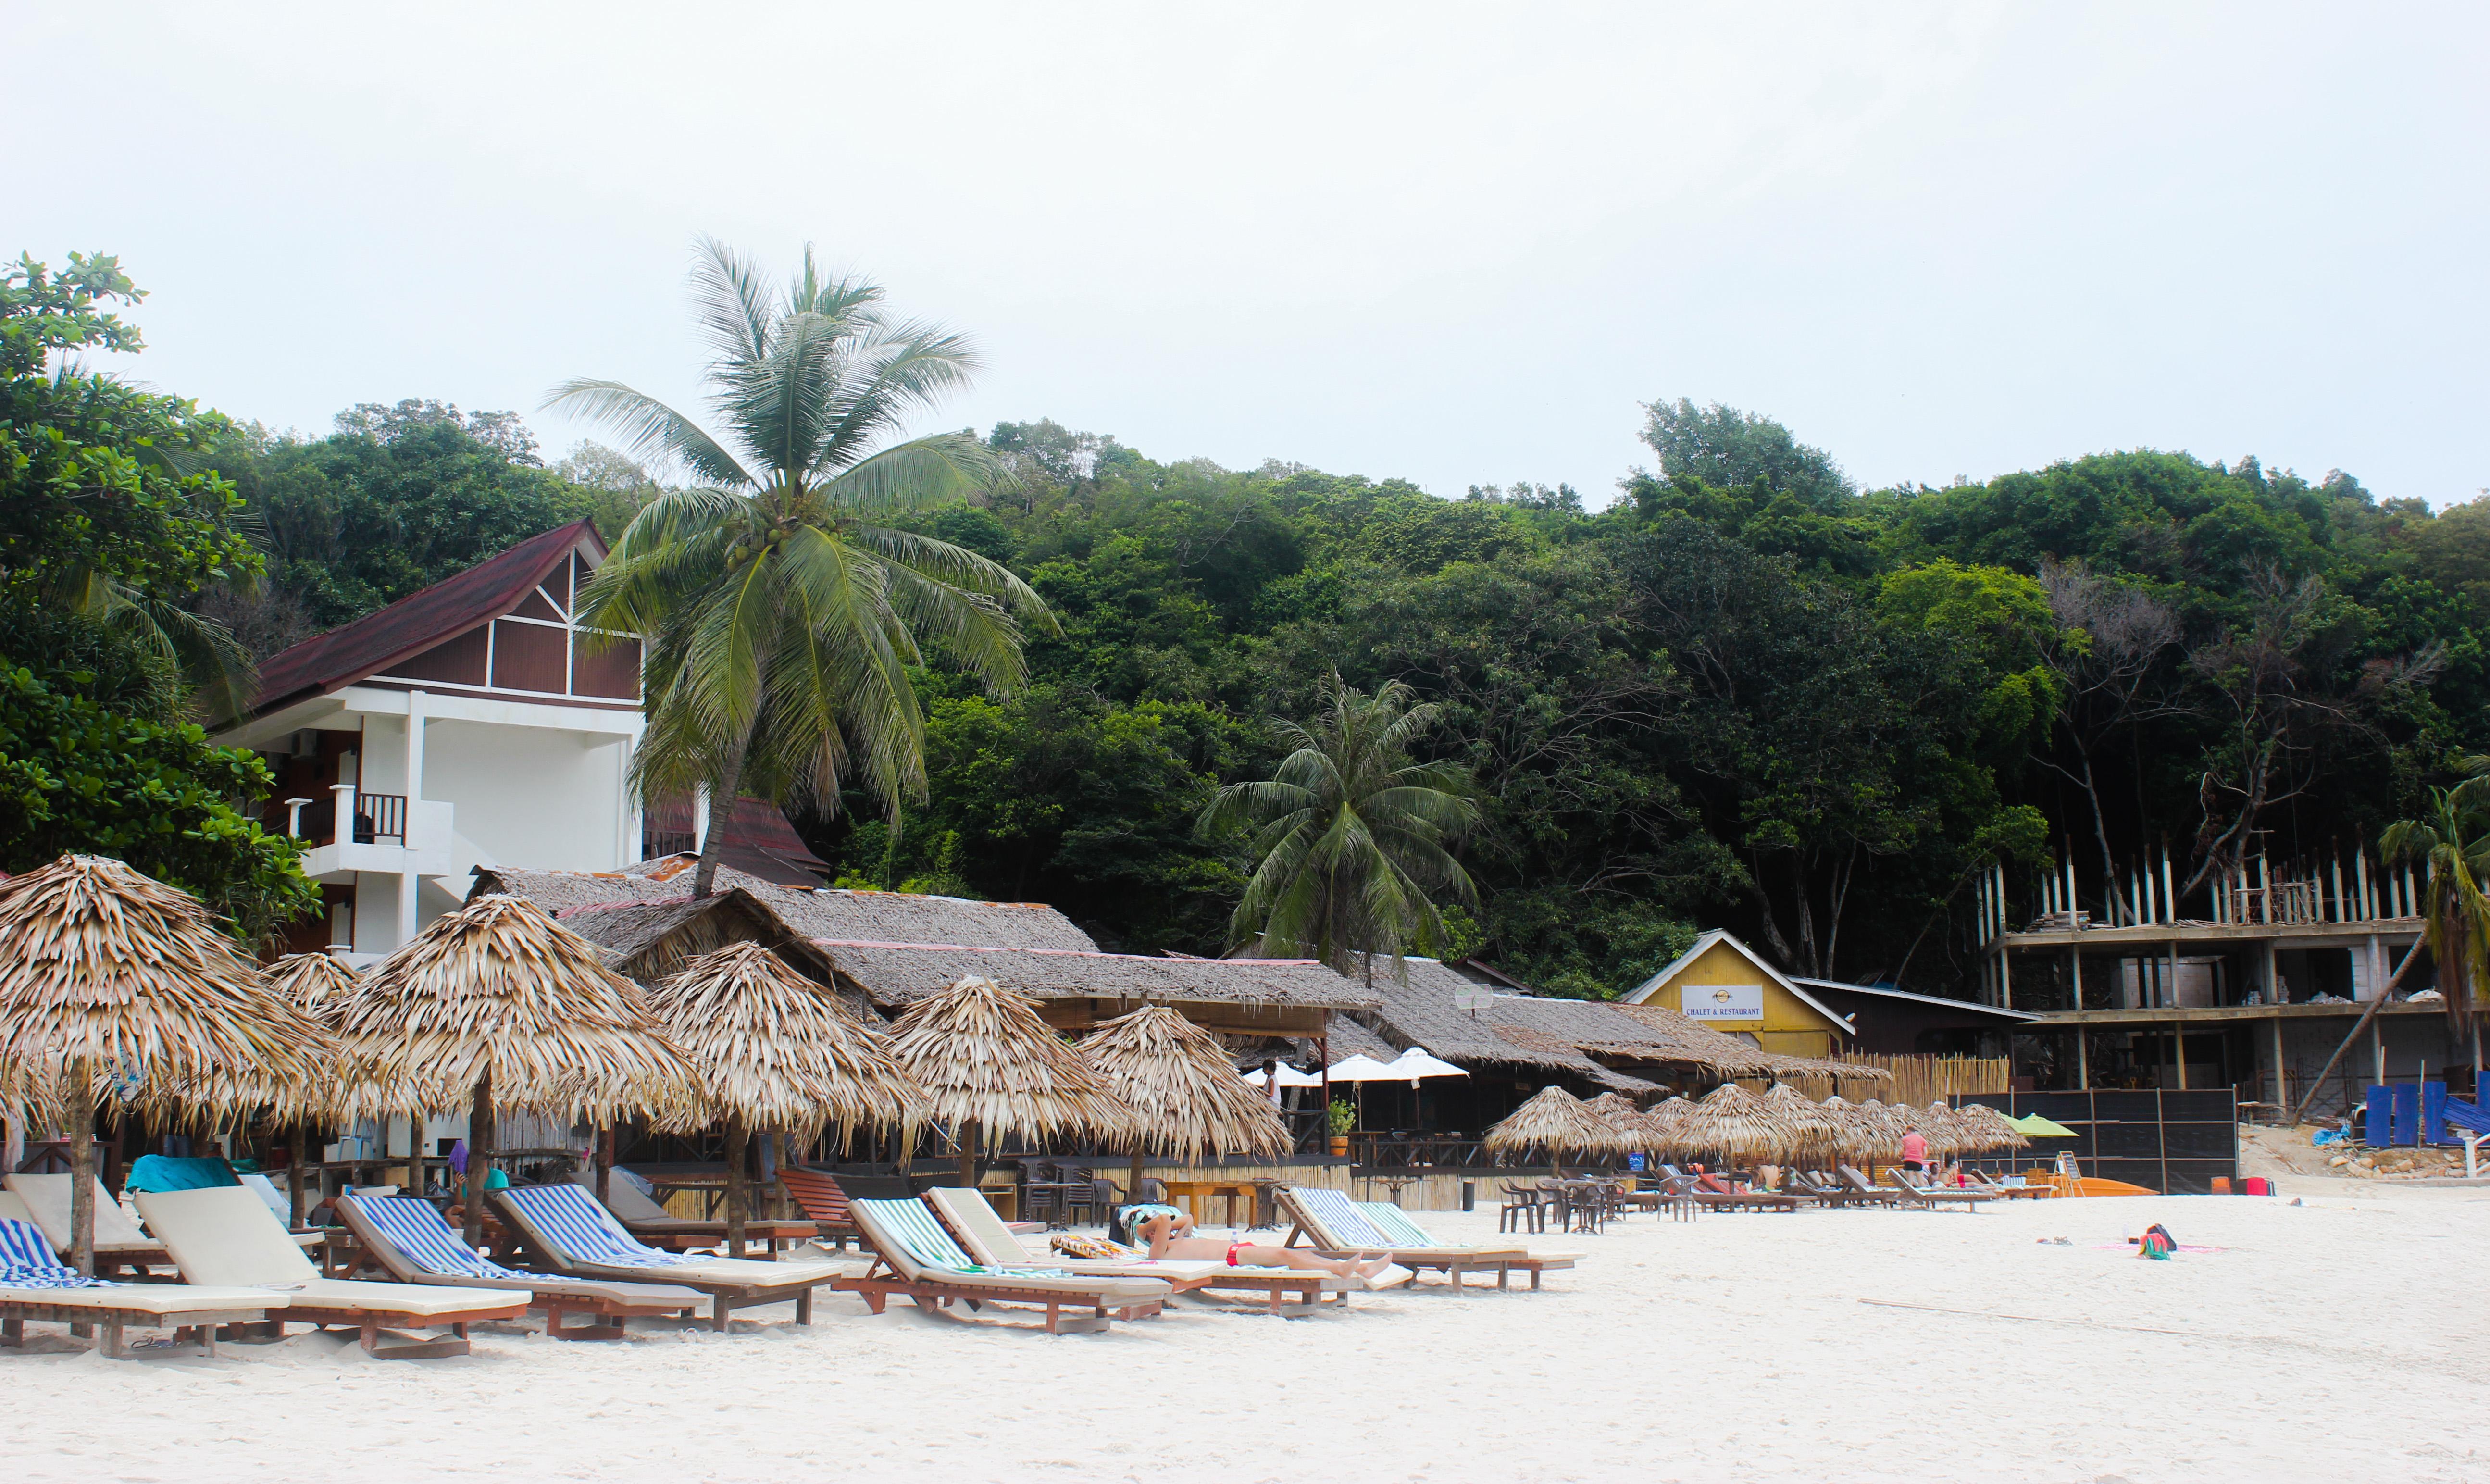 Image de la plage de plage de Pulau kecil